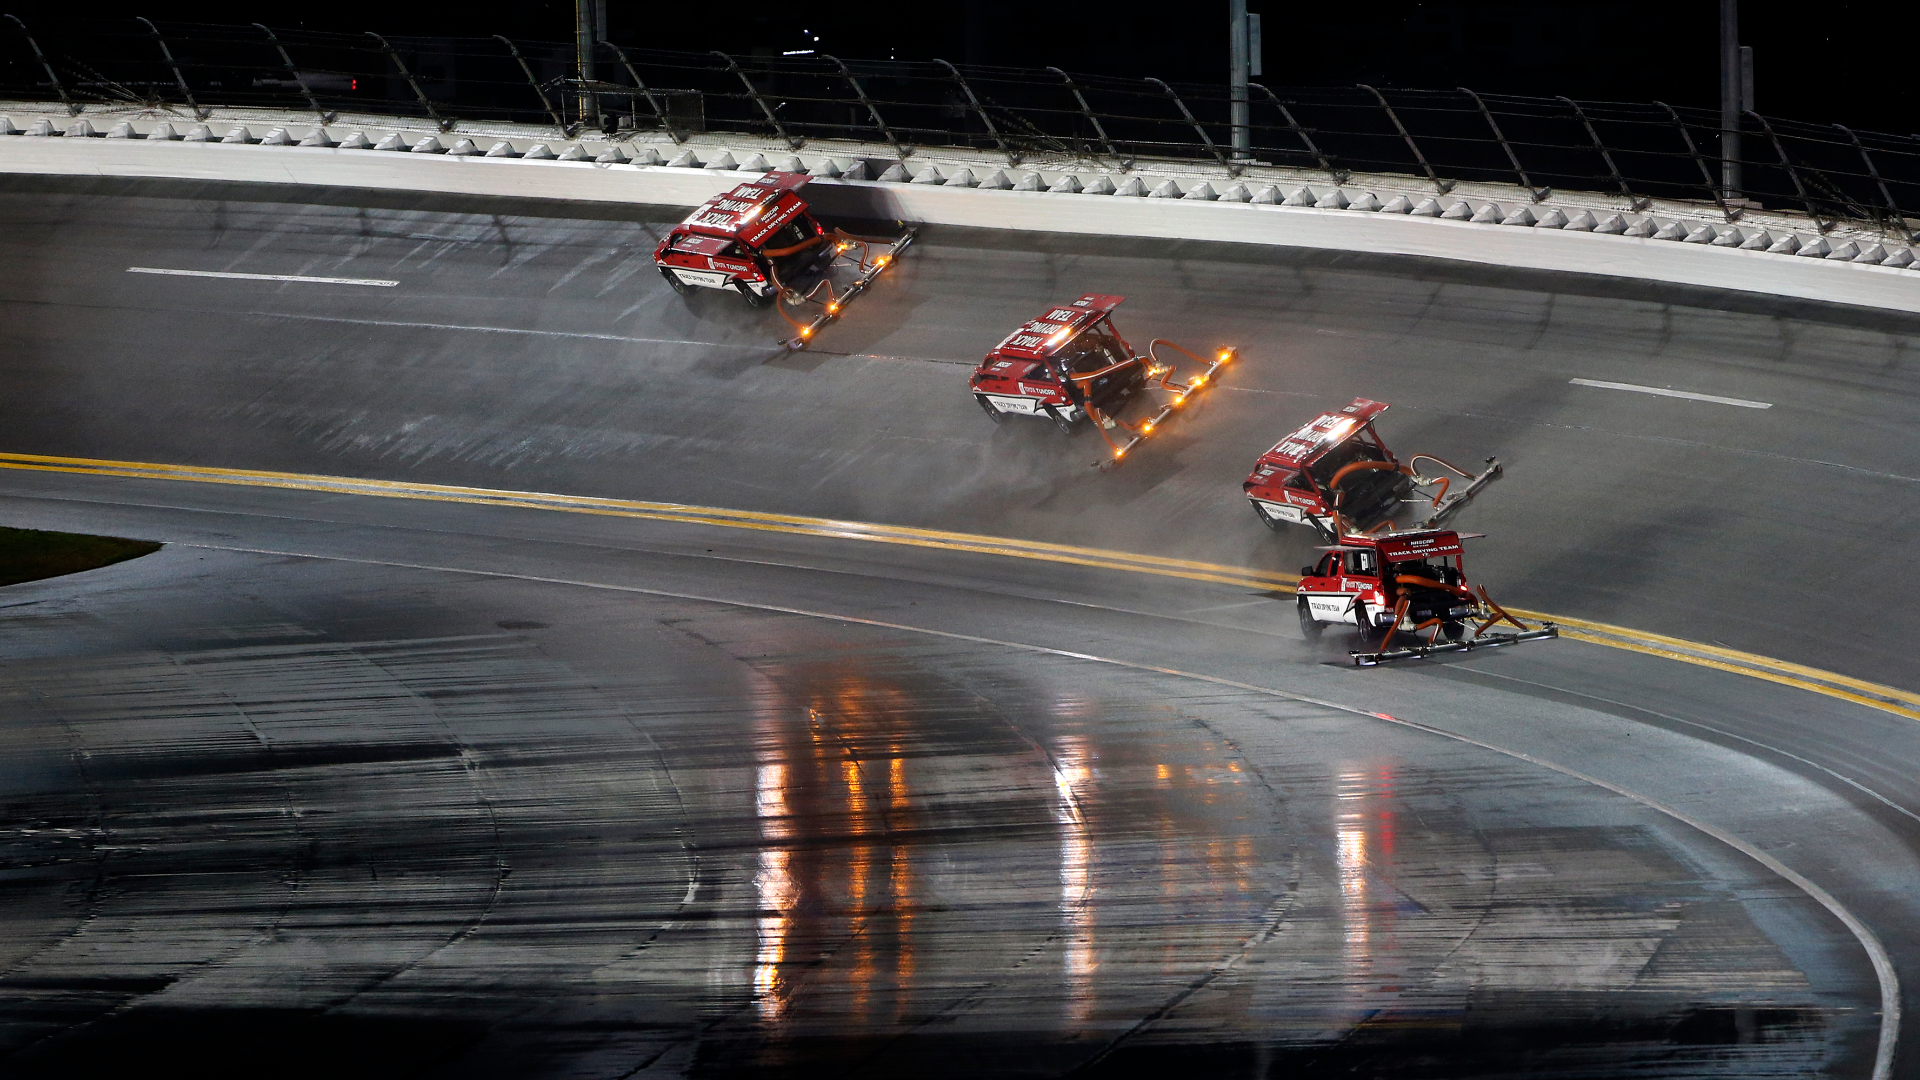 Daytona 500 rain delay updates: How long will weather in forecast delay NASCAR's 2021 race?